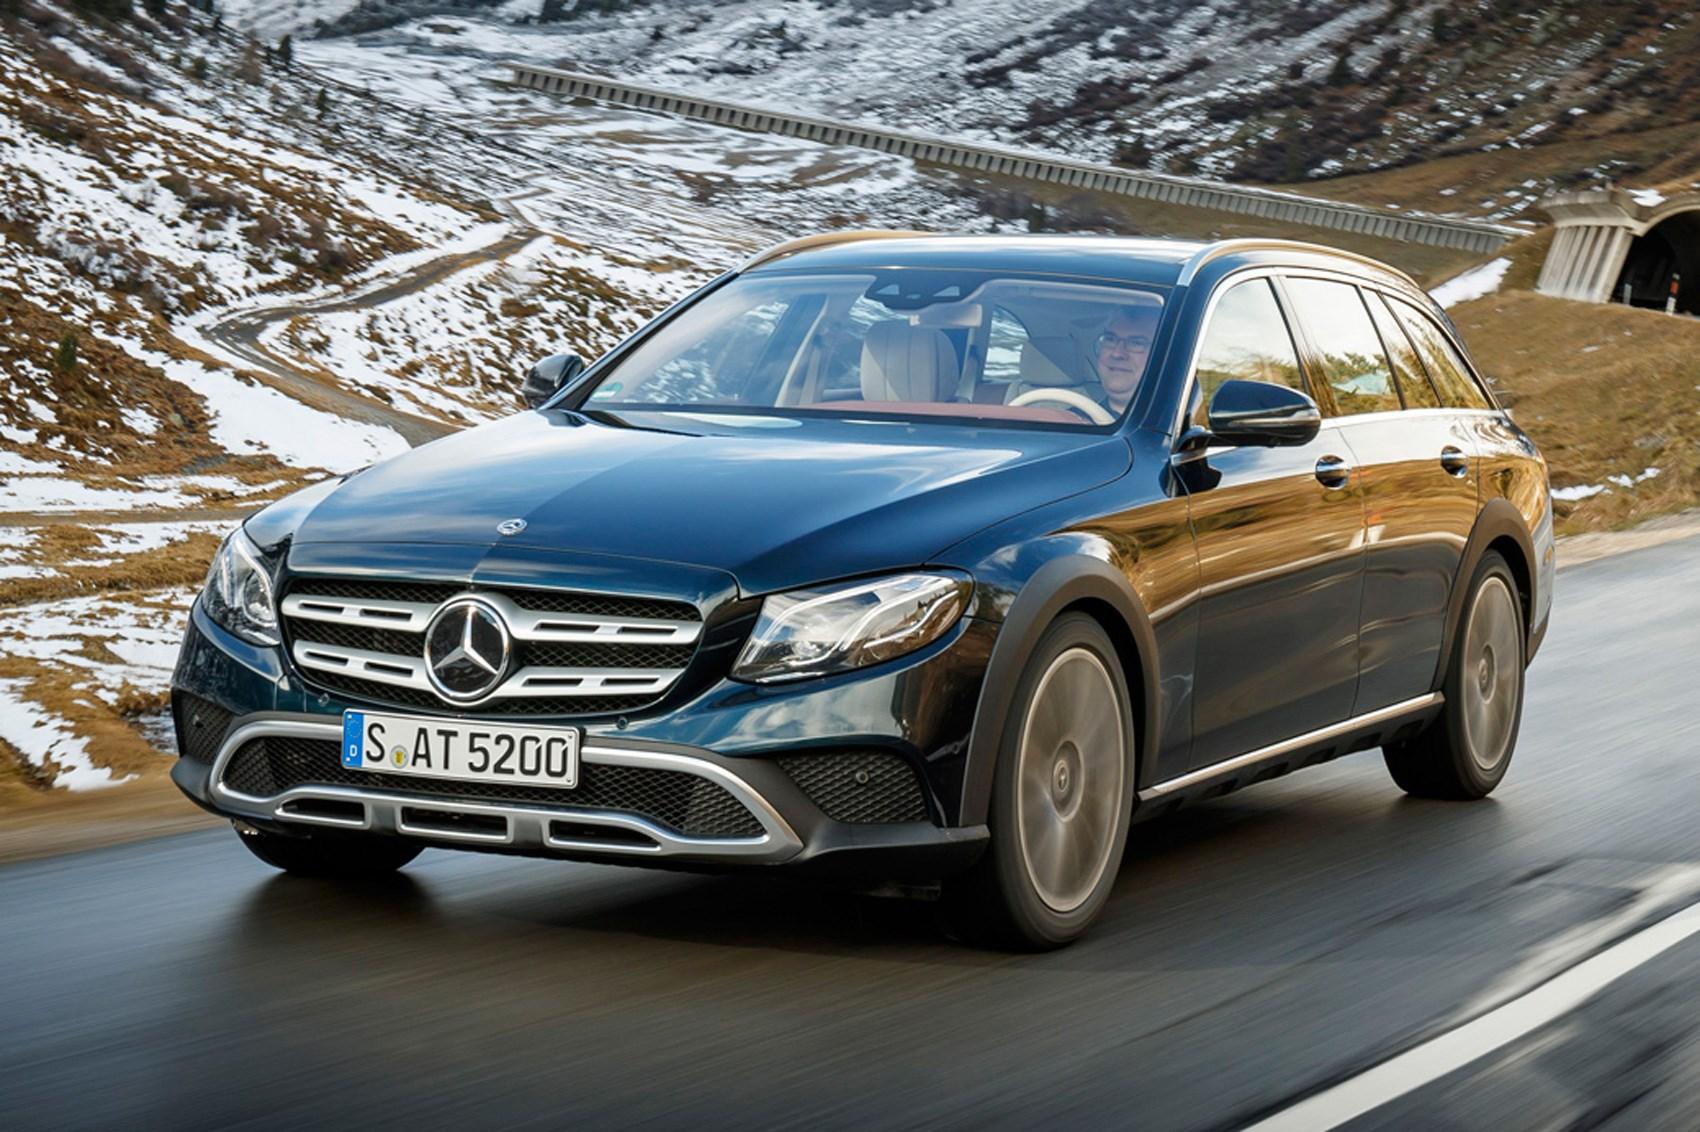 Mercedes Benz Lease Deals 0 Down >> Mercedes E-class 350d All-Terrain (2017) review | CAR Magazine